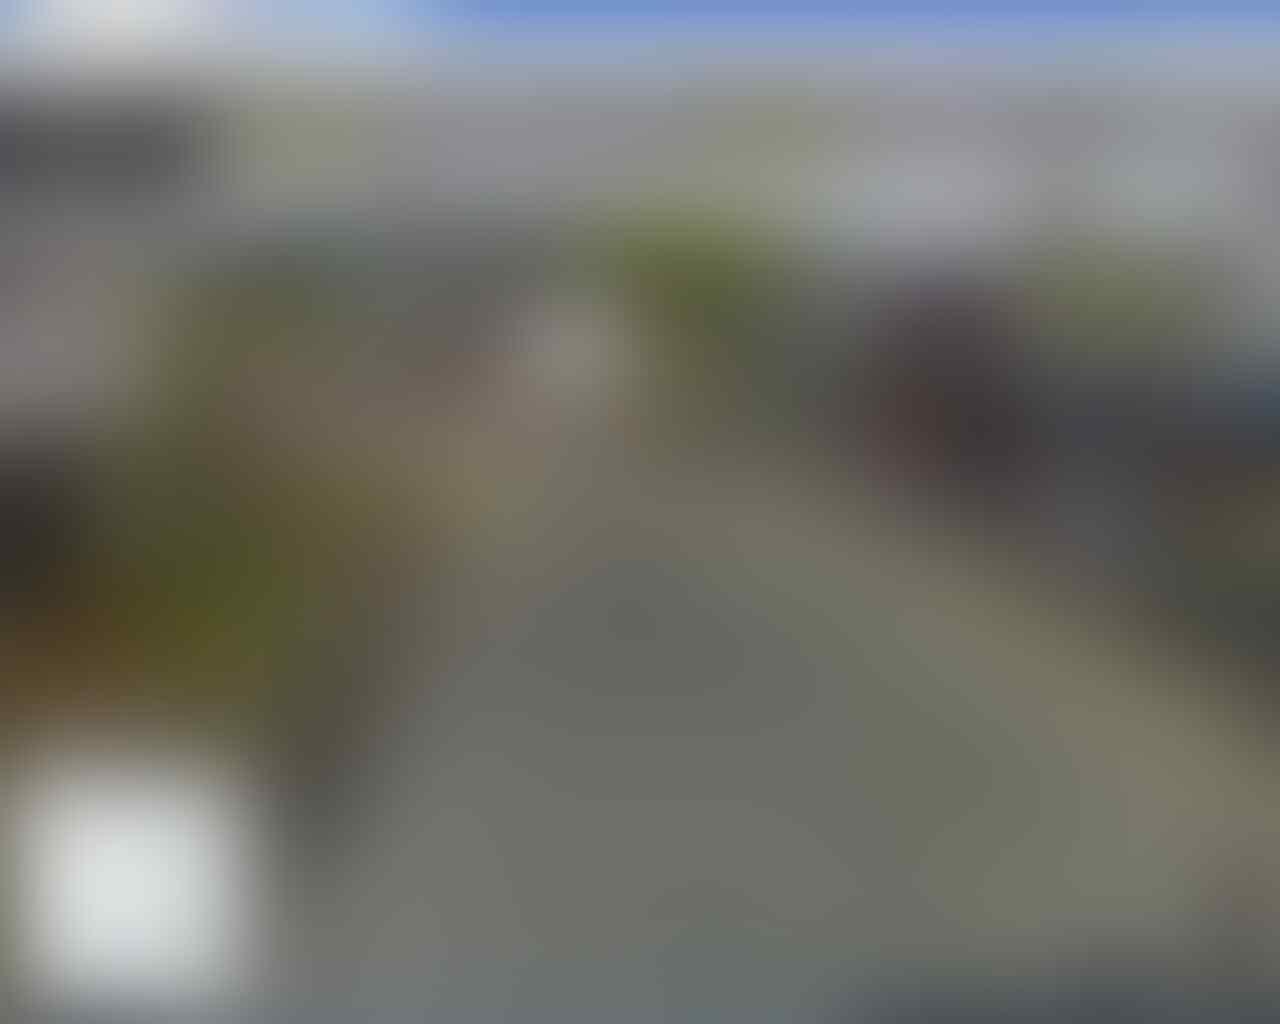 Viral! Video Kereta Berhenti di Tengah Perlintasan, Asisten Masinis Beli Makanan?